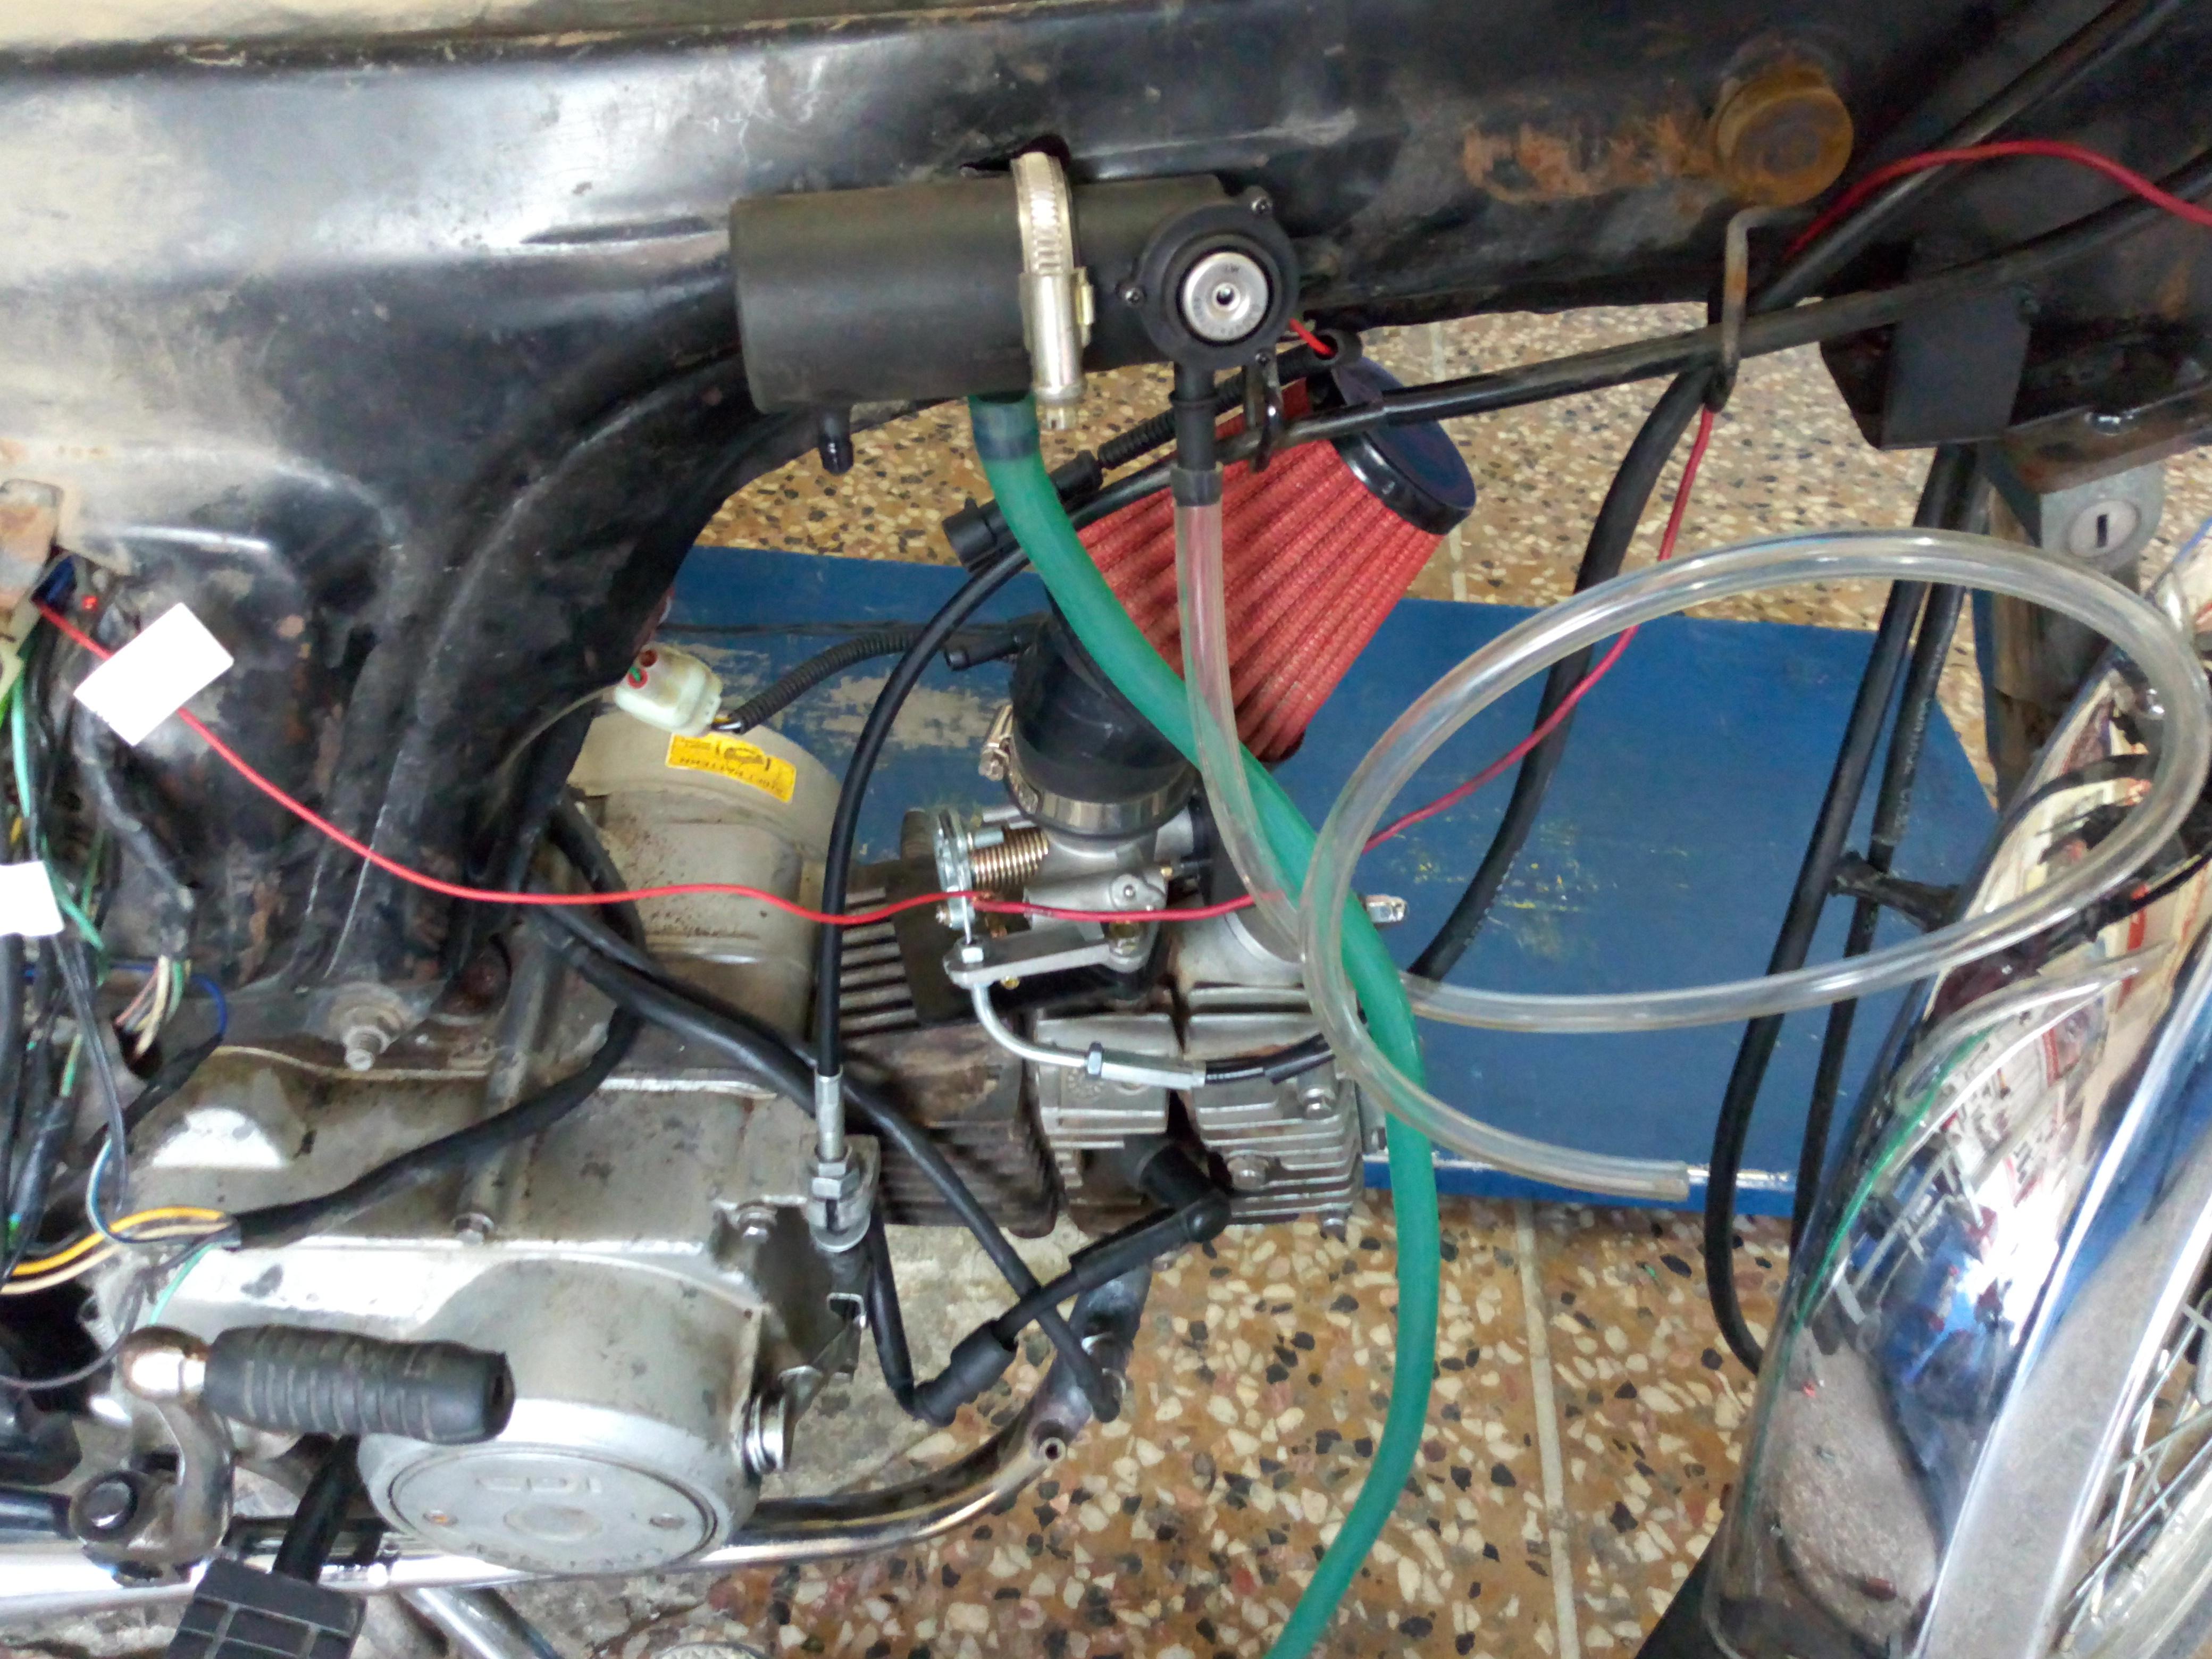 Honda CG 125 to EFI? - Bike Forums - PakWheels Forums